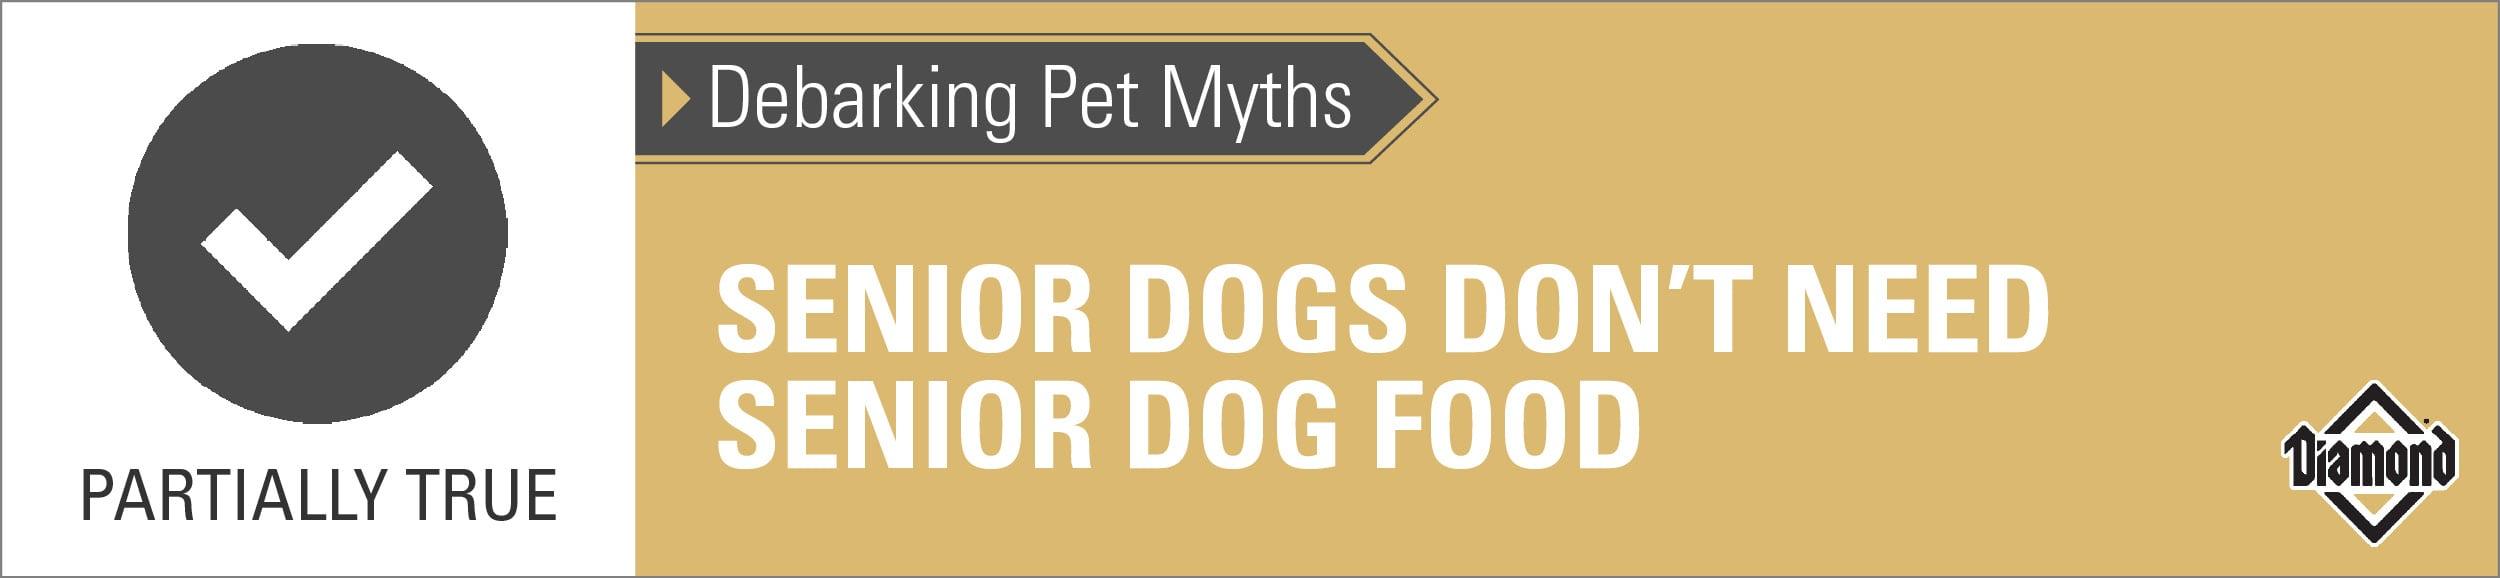 Senior Dogs May Not Need a Senior Diet   Diamond Pet Foods